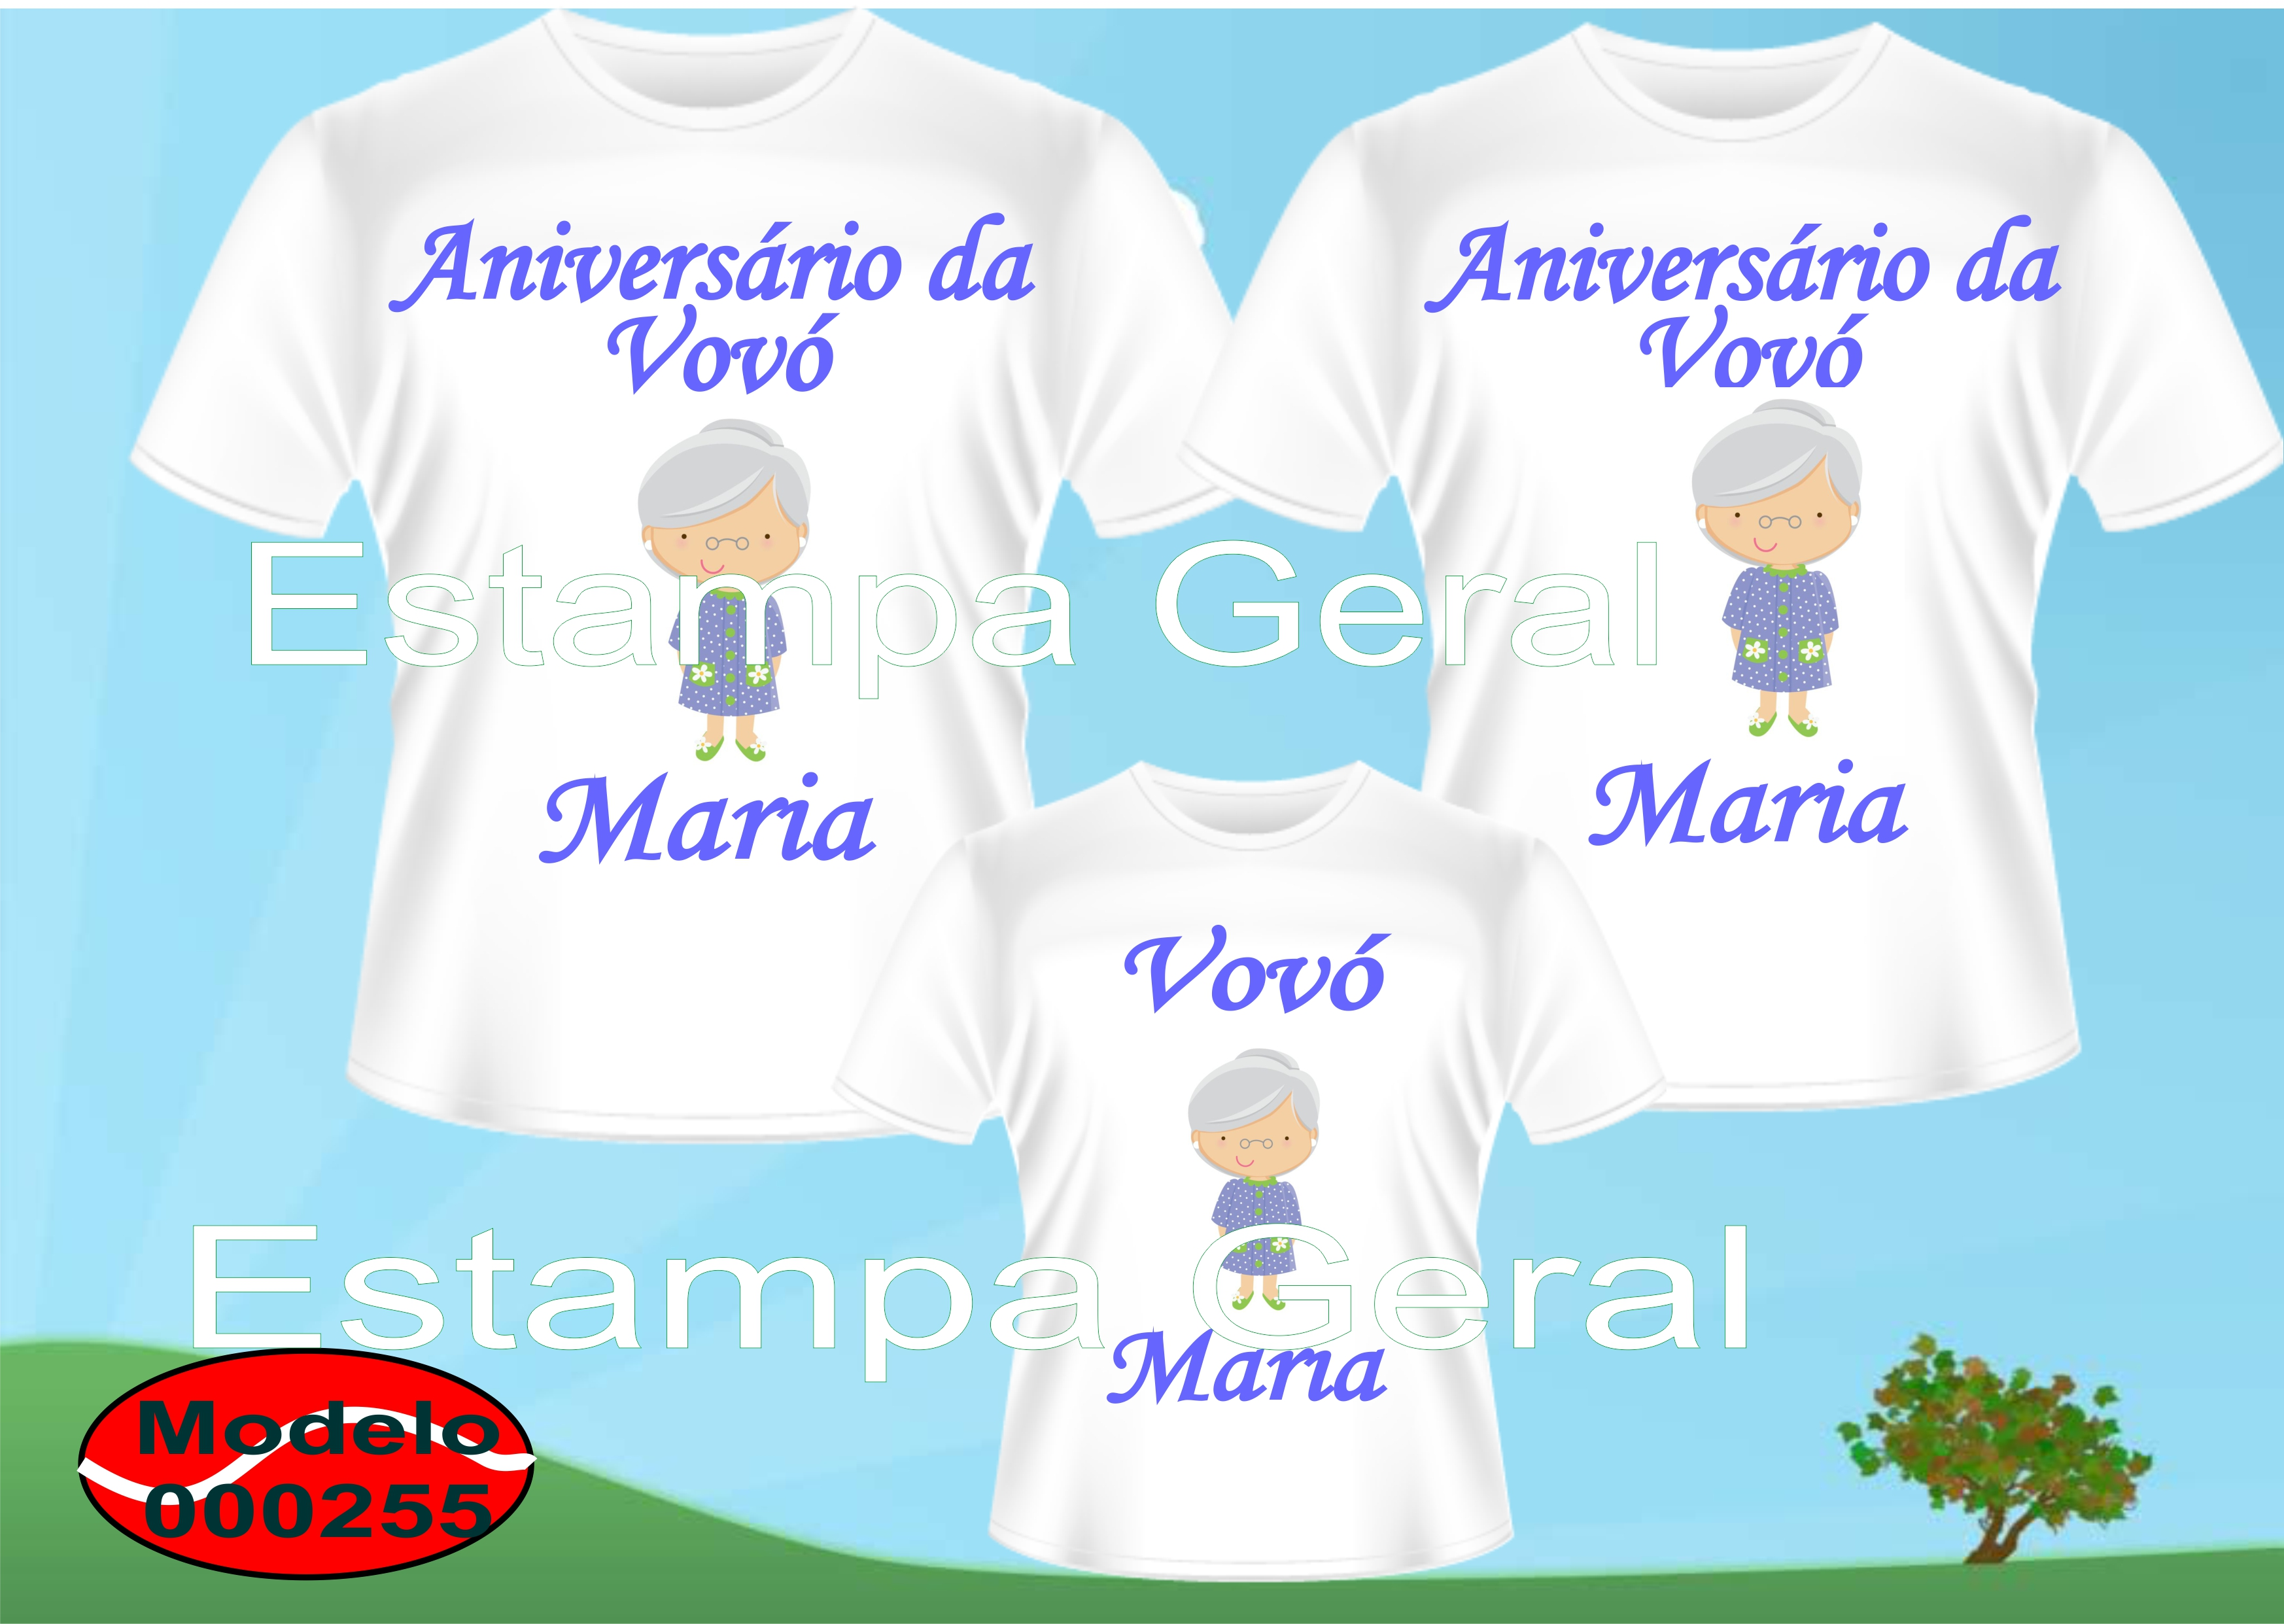 Camiseta Personalizada Vovó Elo7